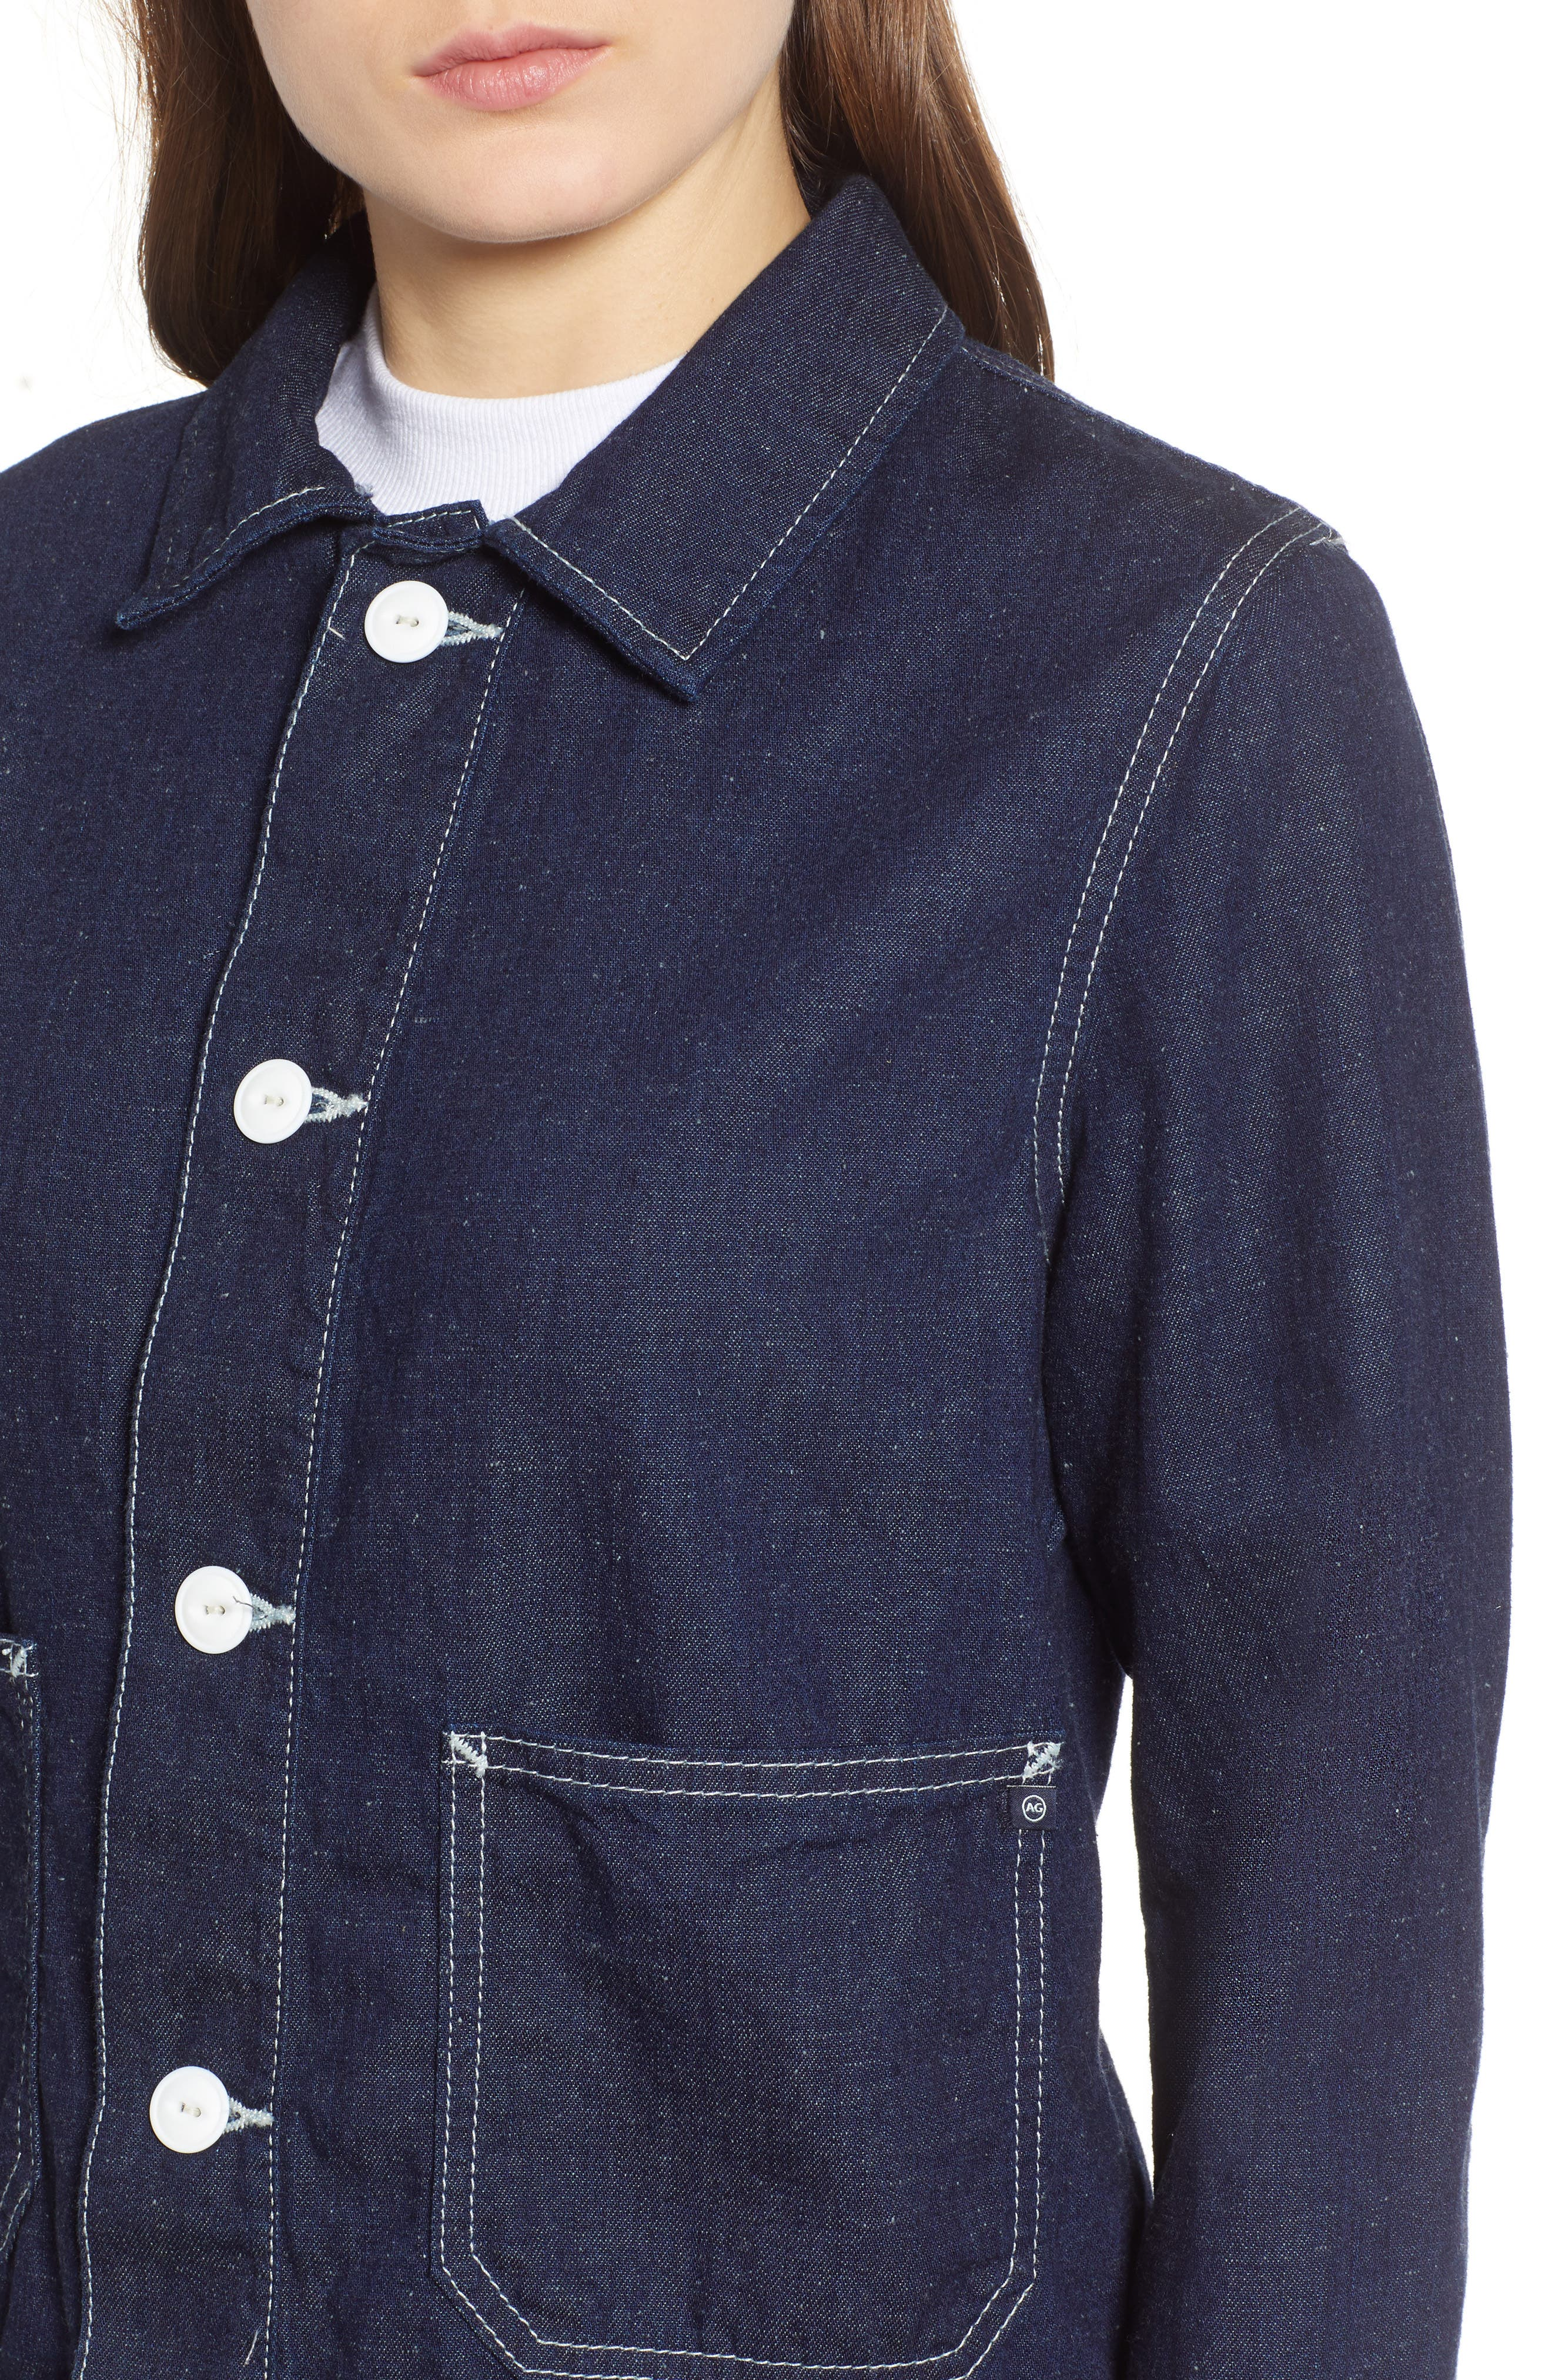 Avenall Jacket,                             Alternate thumbnail 4, color,                             MIDNIGHT SURGE MTS